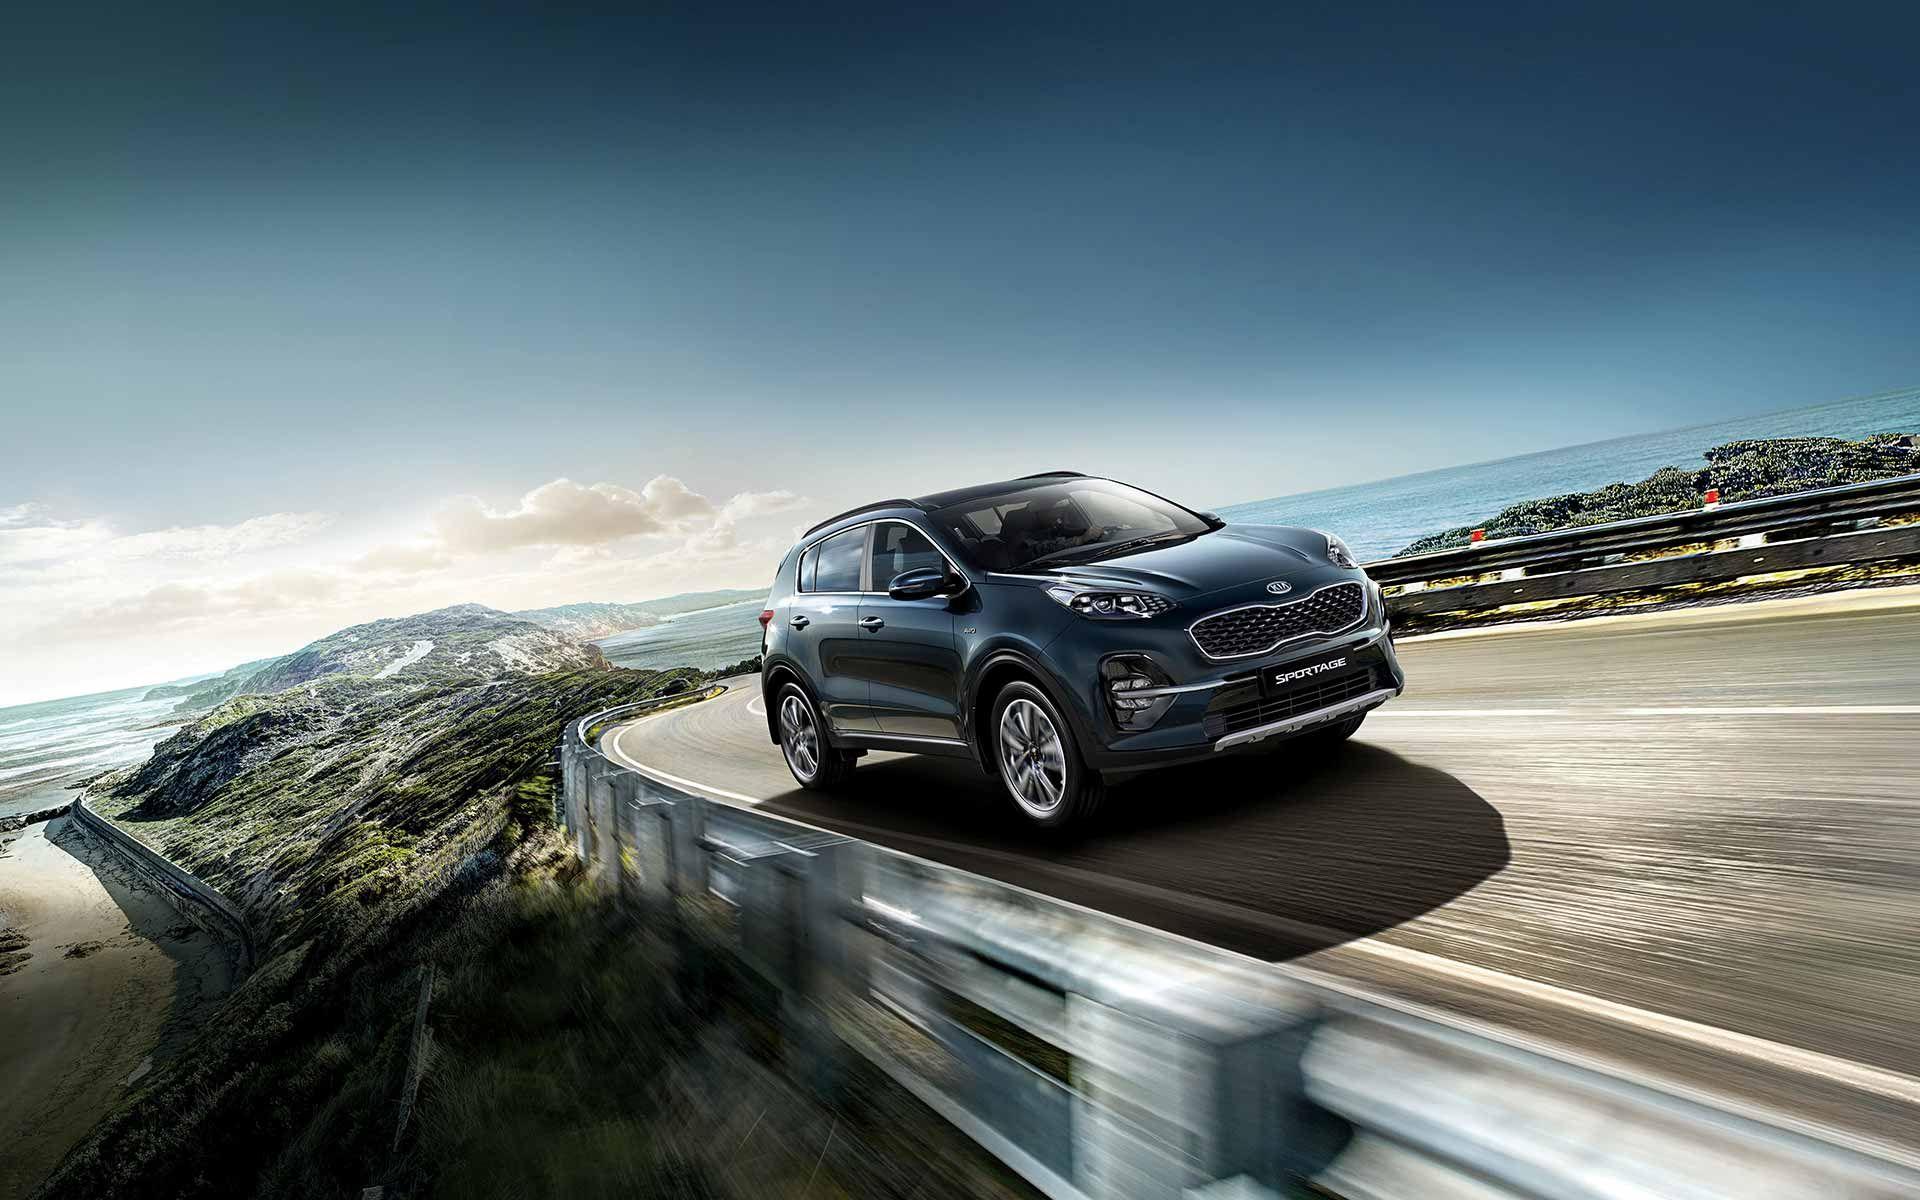 Car Dealerships in Albuquerque, NM Reveal Best Kia Car for